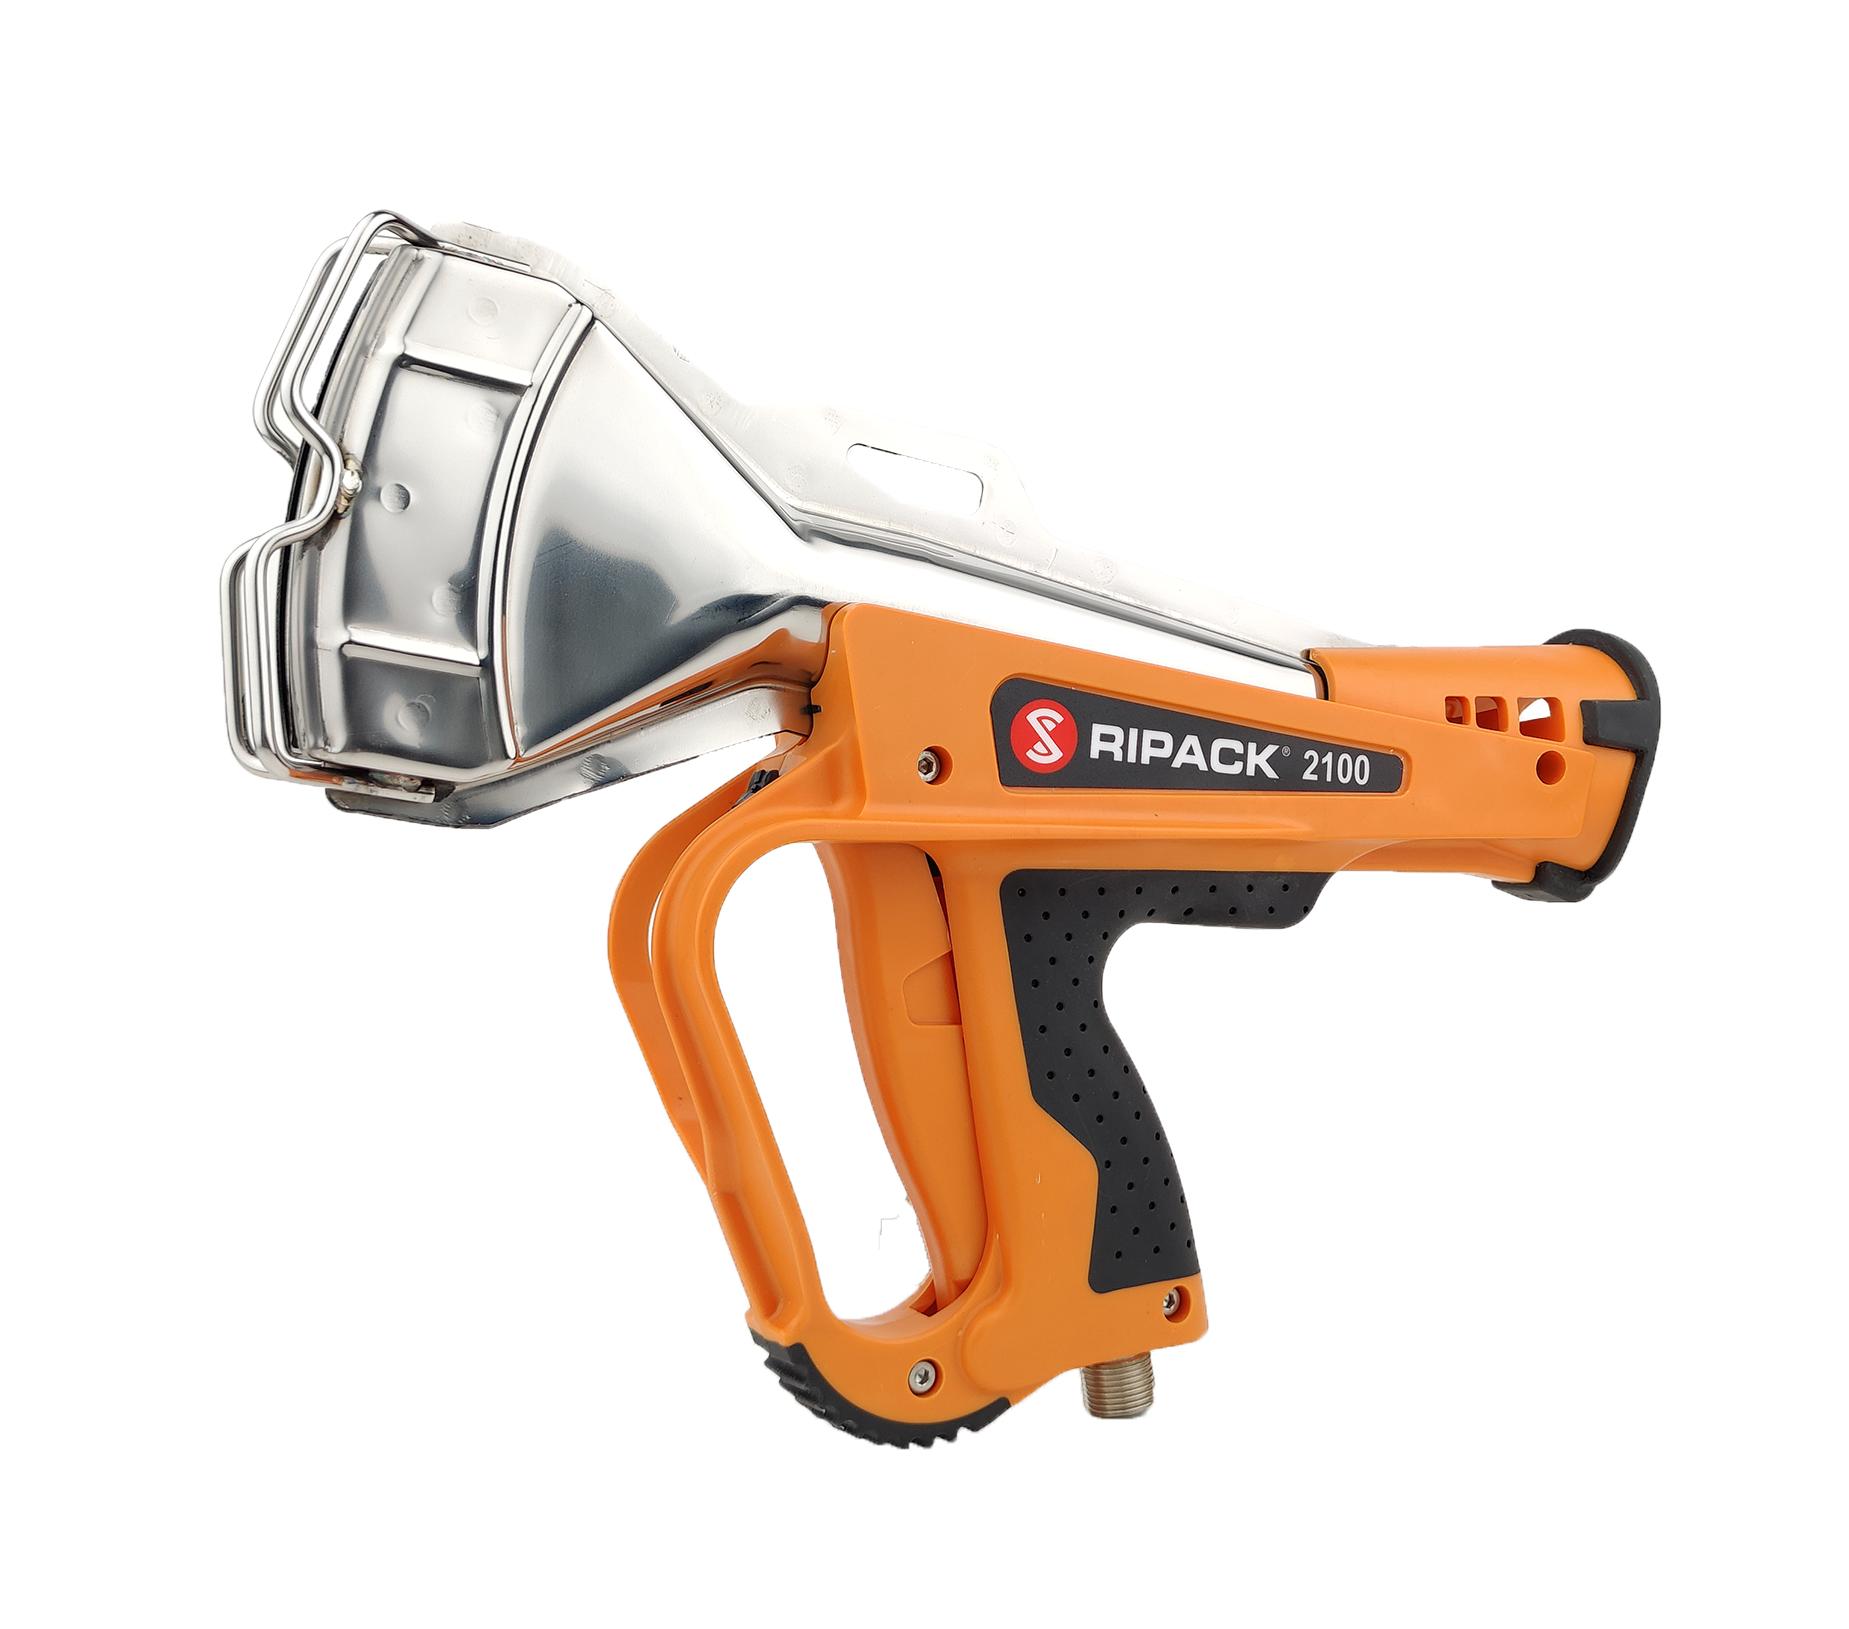 Ripack-2100-shrink-isi-tabancasi